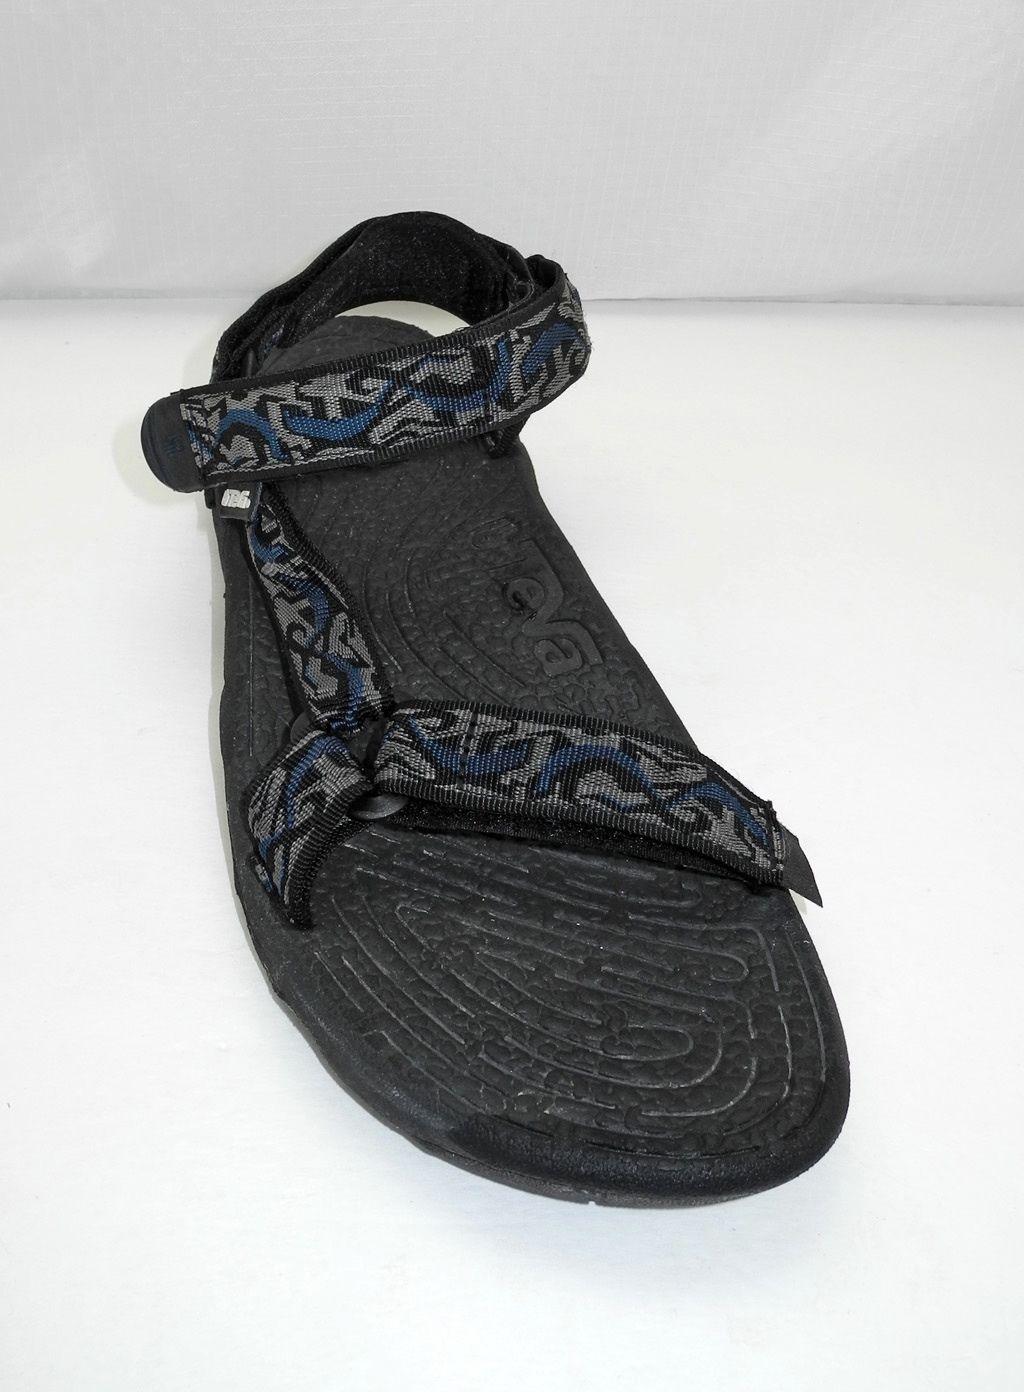 2959bddab3a Teva Terradactyl  6601 Blue Grey Black and similar items